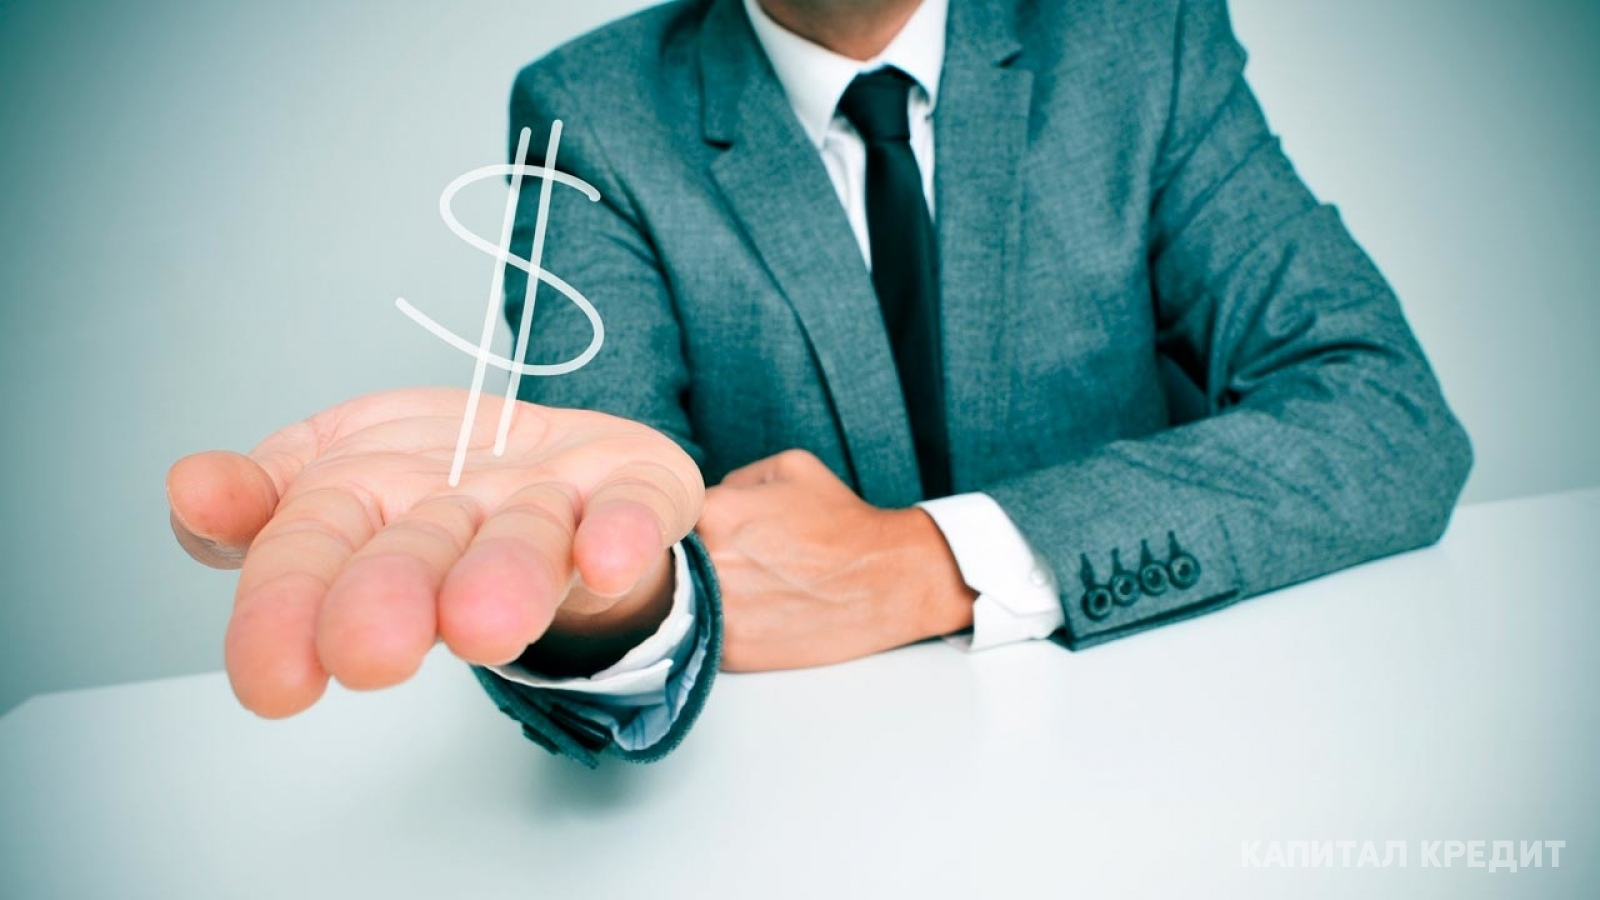 Взять кредит у частного инвестора без залога срочно на карту без отказа